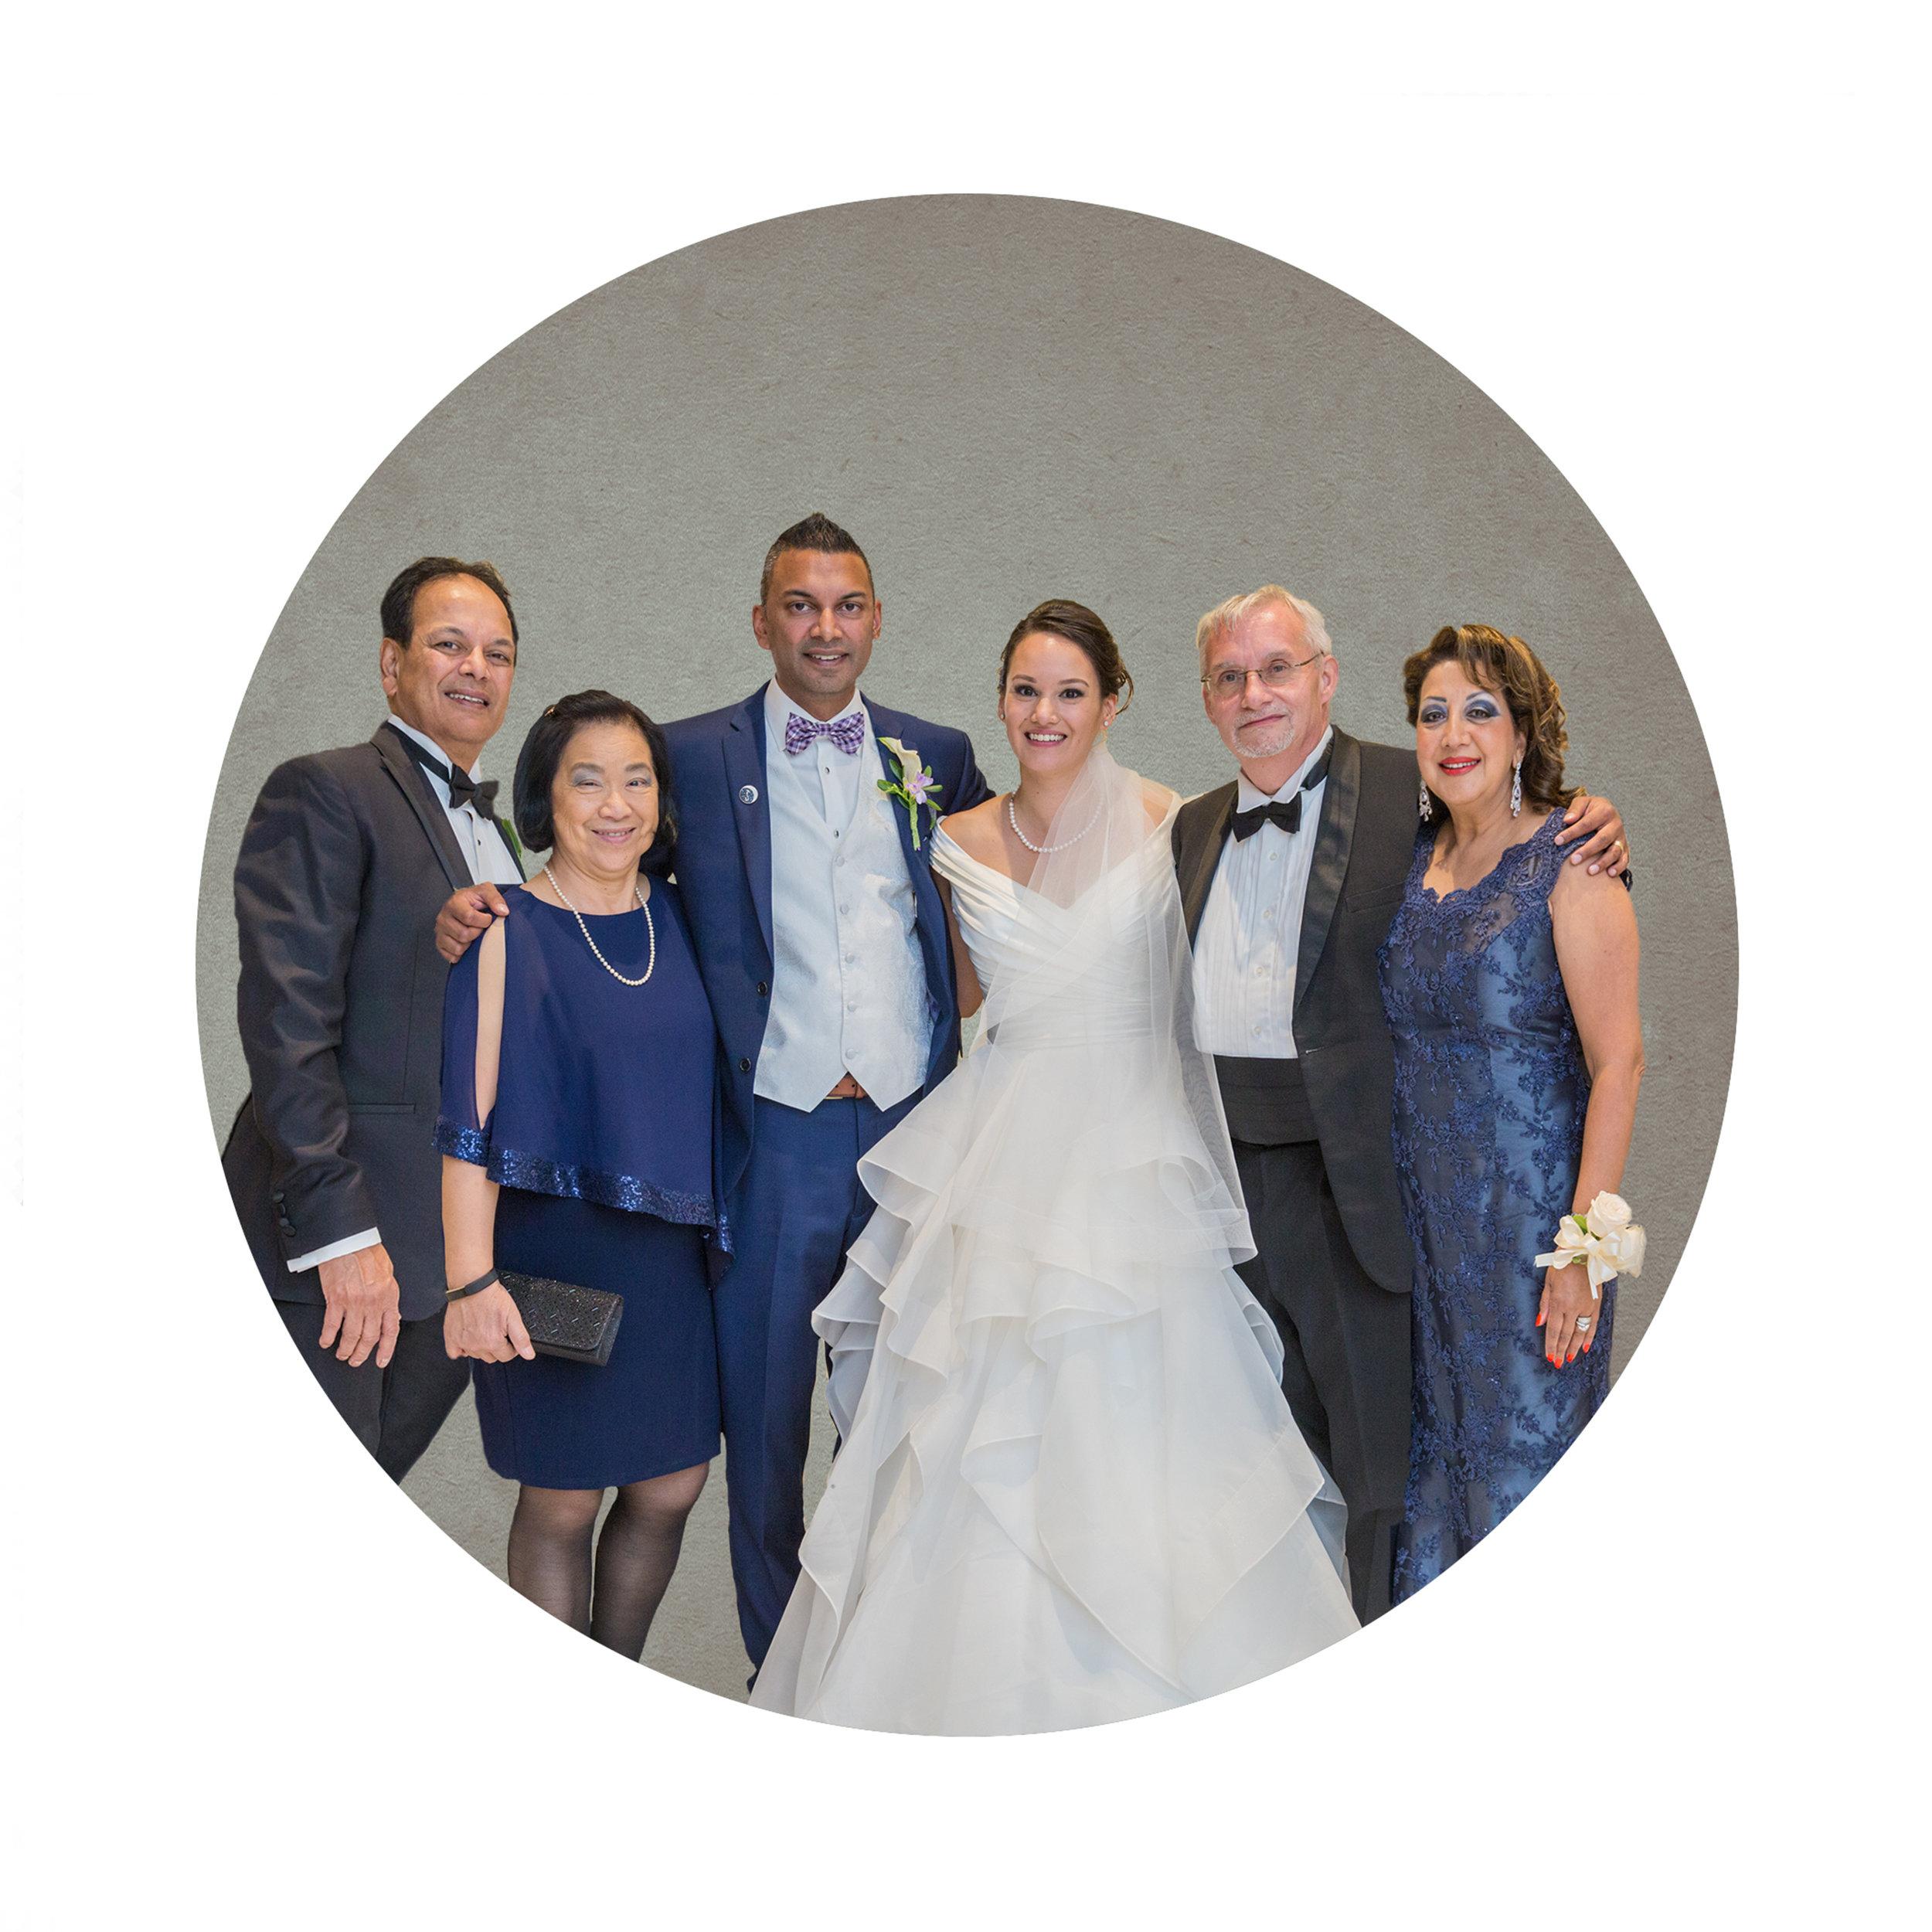 Daughter's Wedding, Toronto, 2017